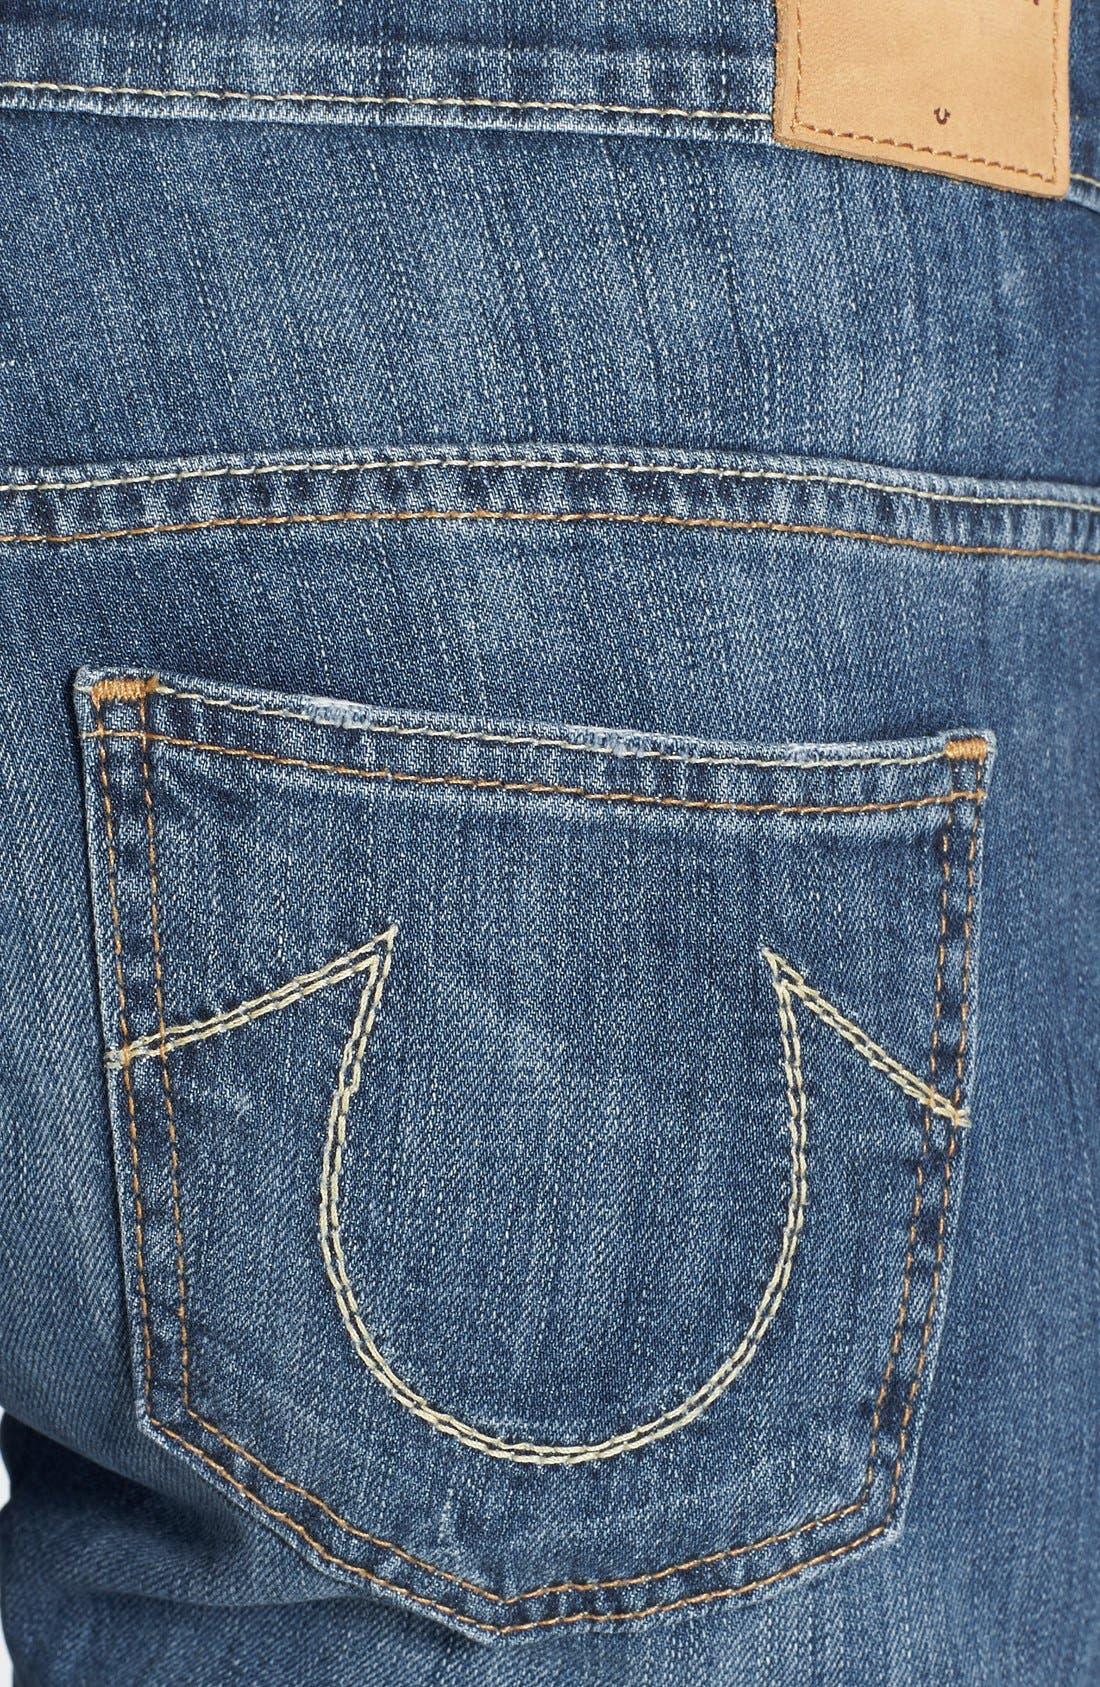 Alternate Image 3  - True Religion Brand Jeans 'Audrey' Boyfriend Jeans (Spring Ink)